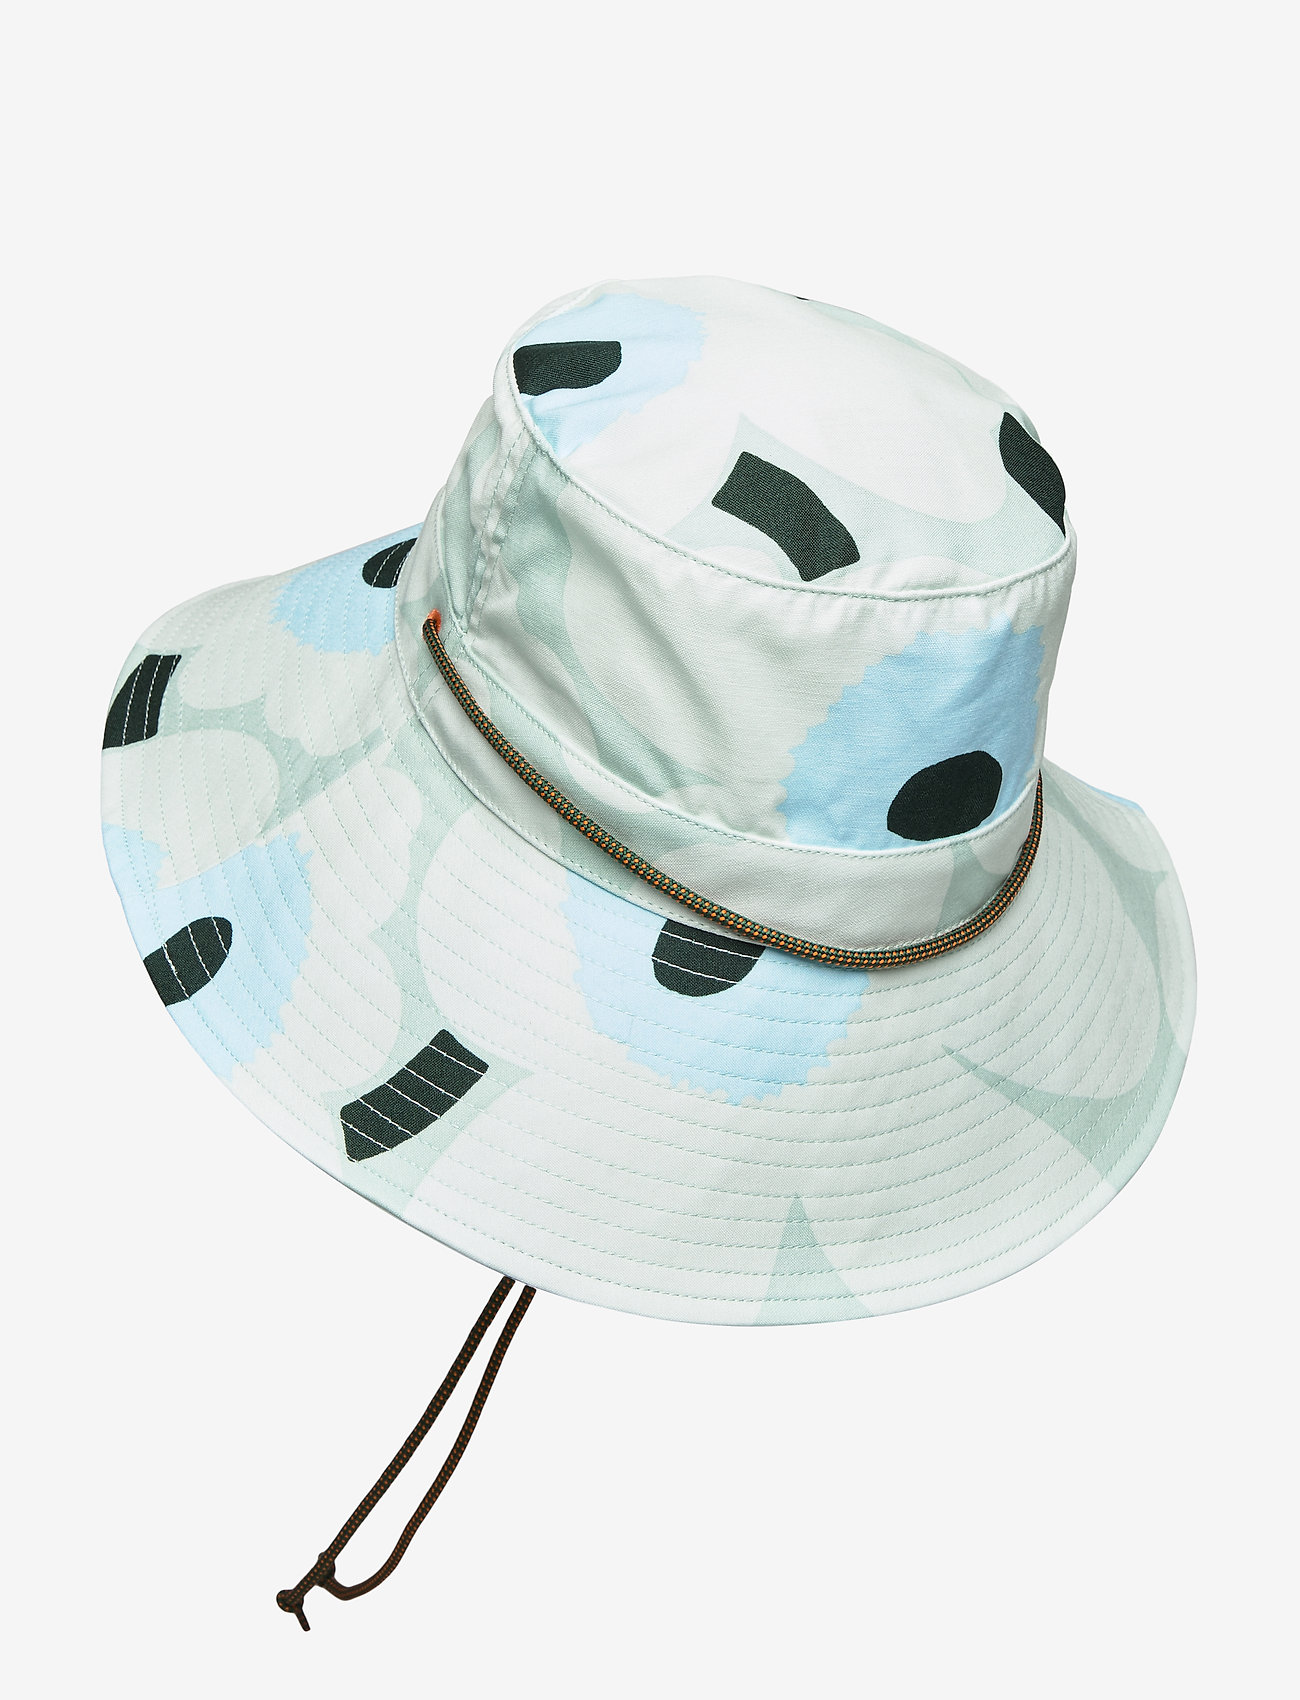 Marimekko - ADOLINA PIENI UNIKKO HAT - emmer hoeden - light turquoise,blue,green - 1